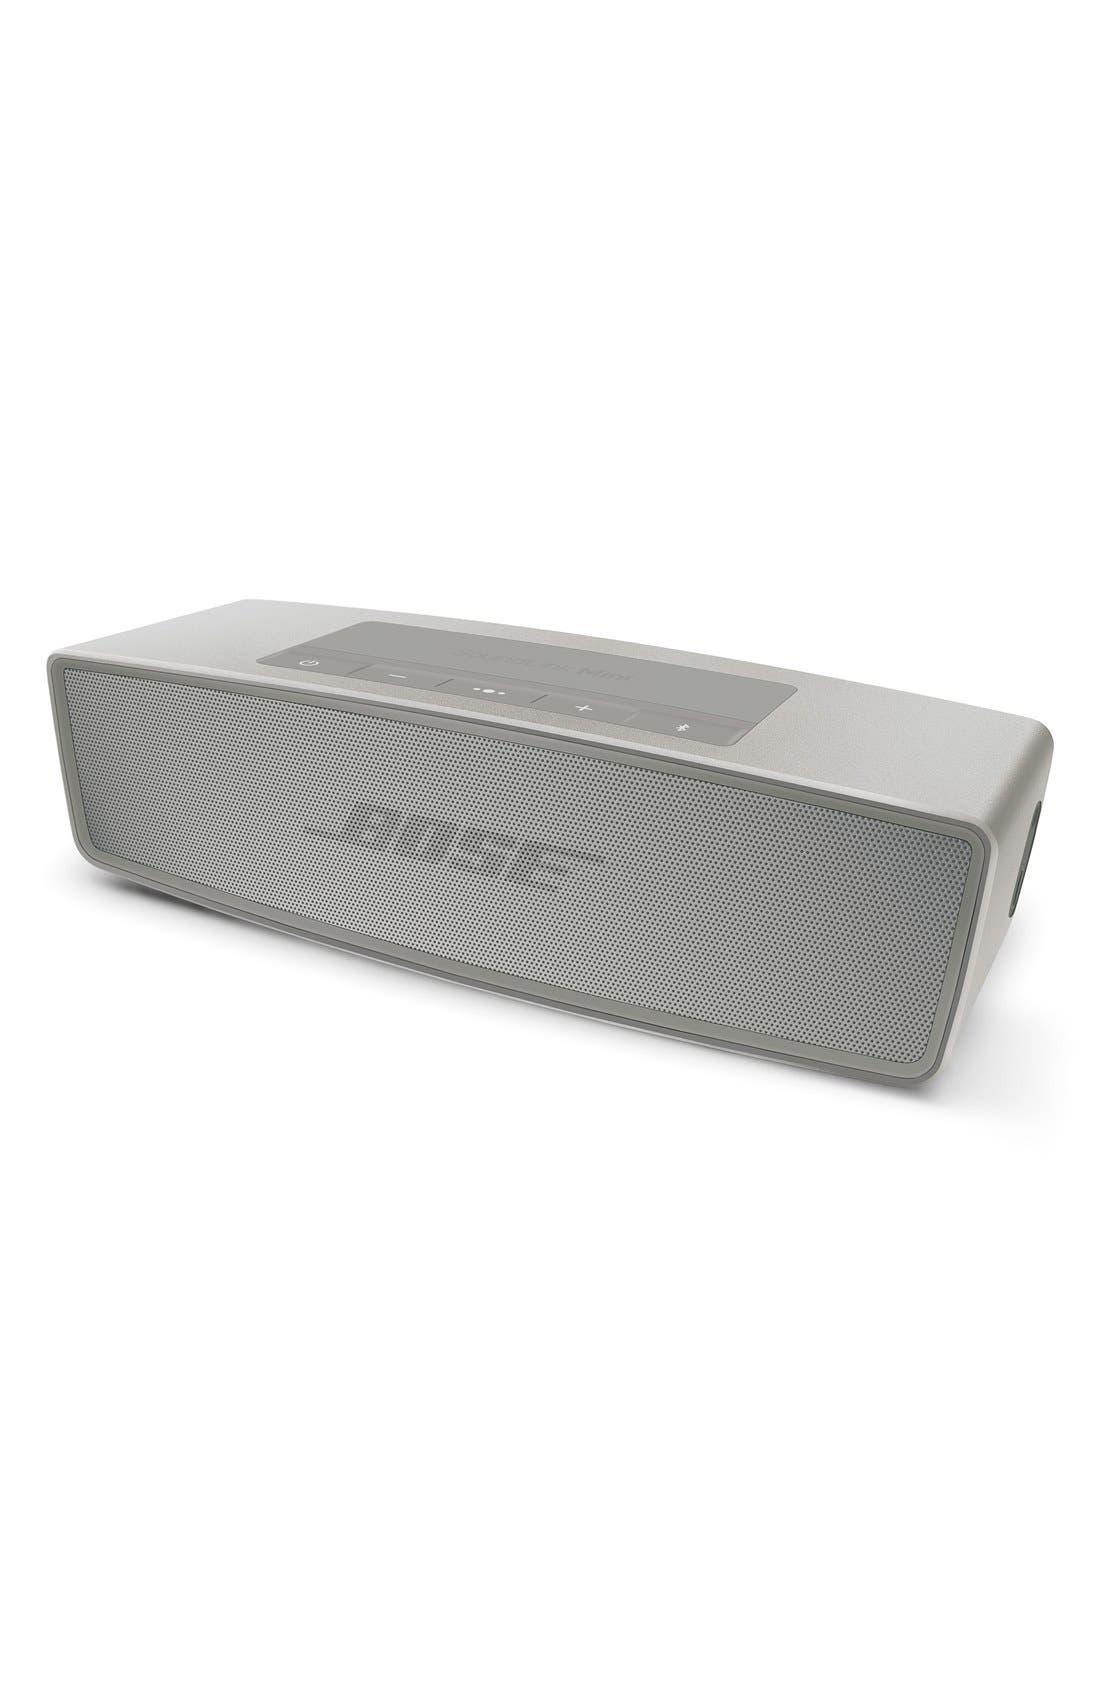 Main Image - Bose® SoundLink® Mini II Bluetooth® Speaker